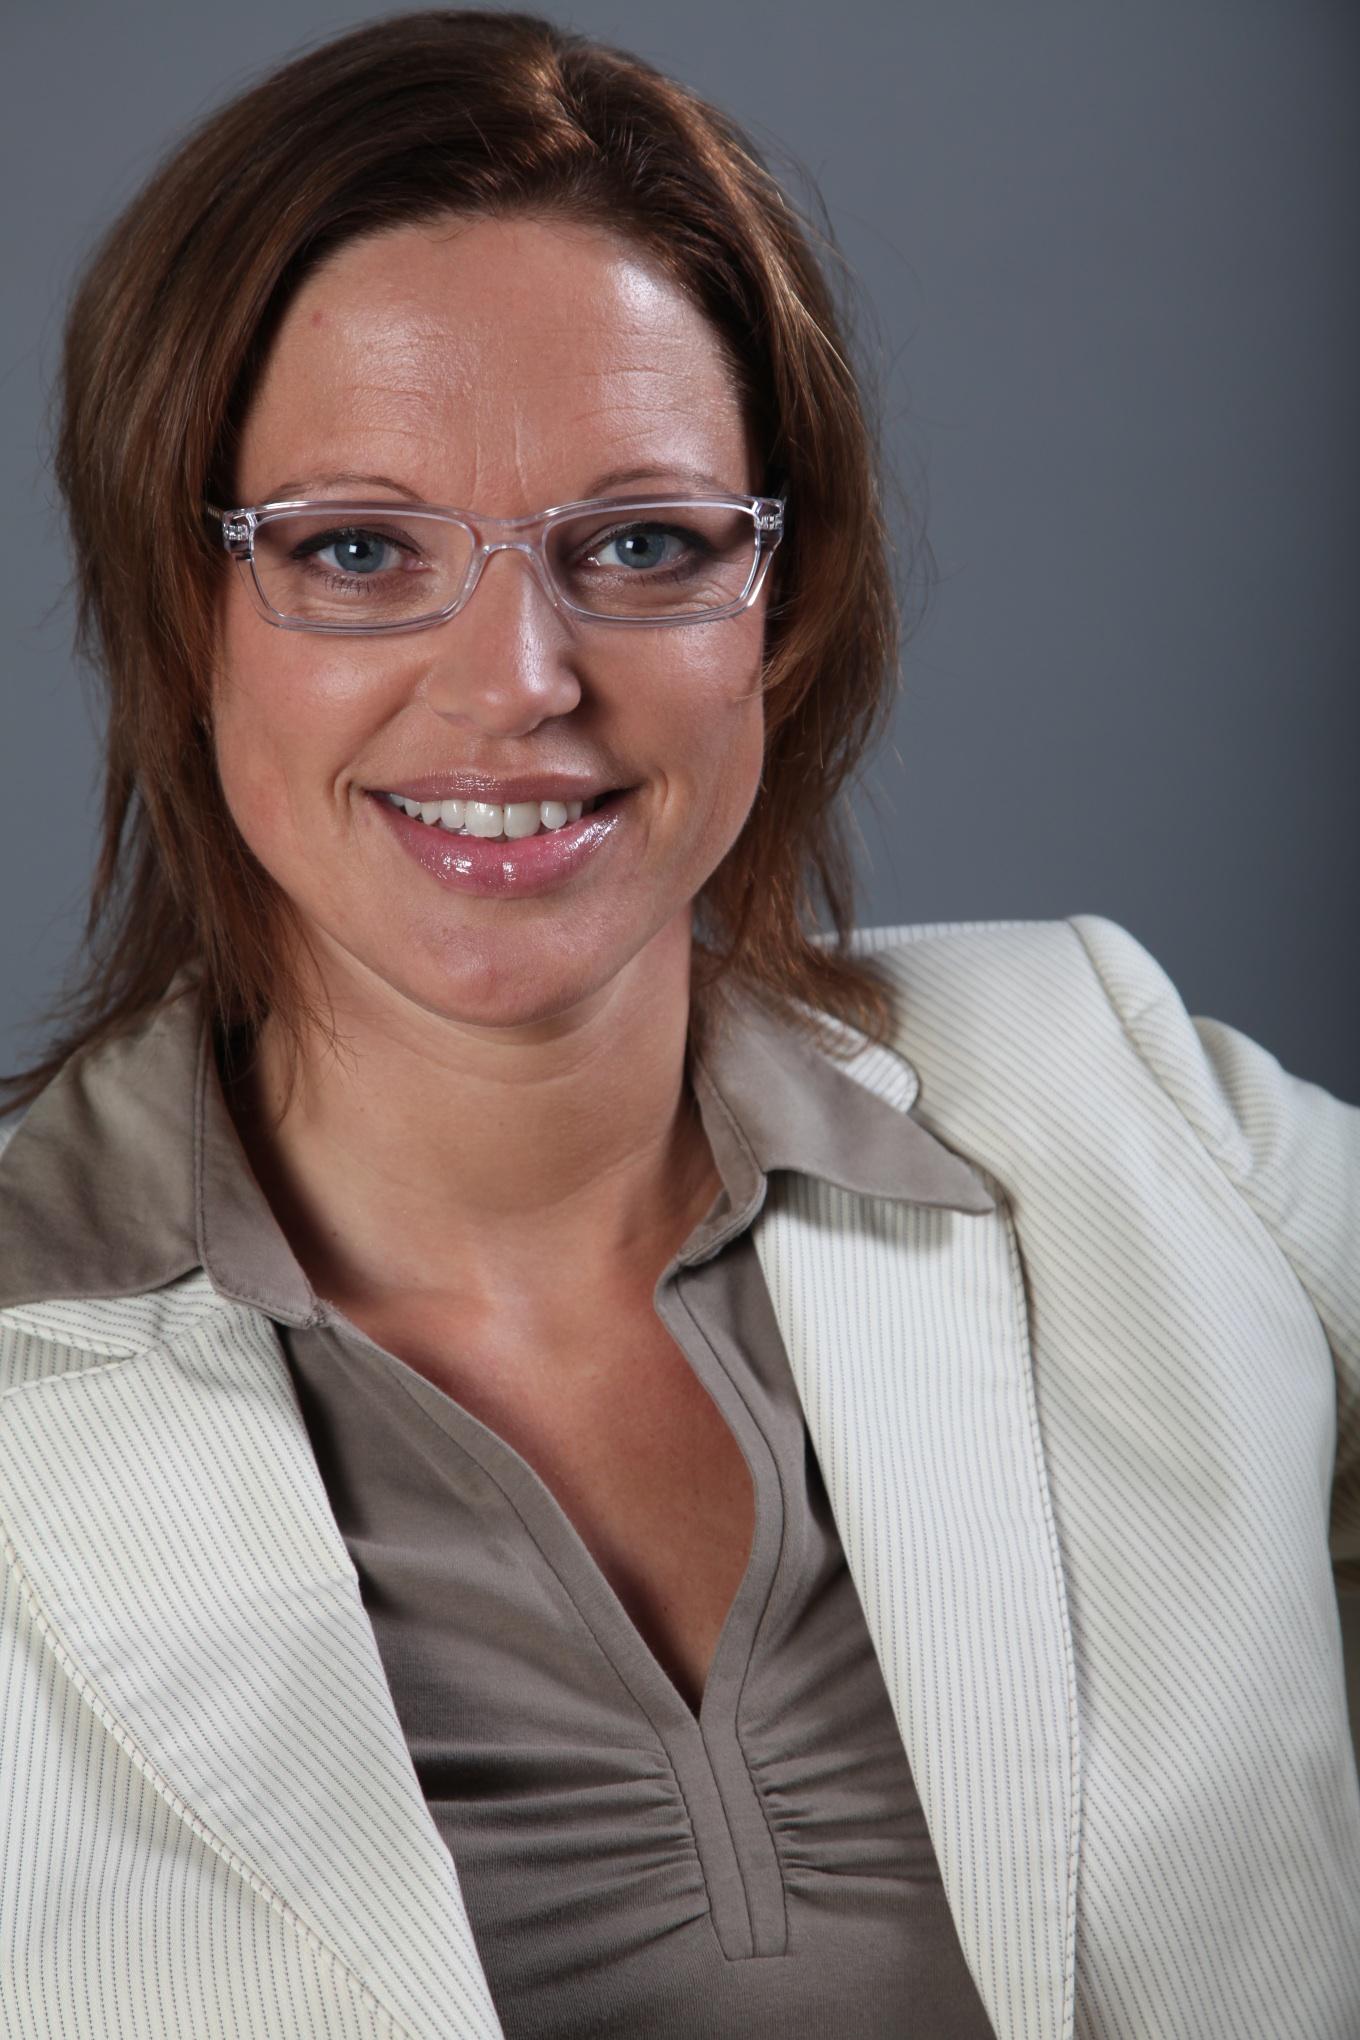 Portretfoto fotostudio grijze achtergrond